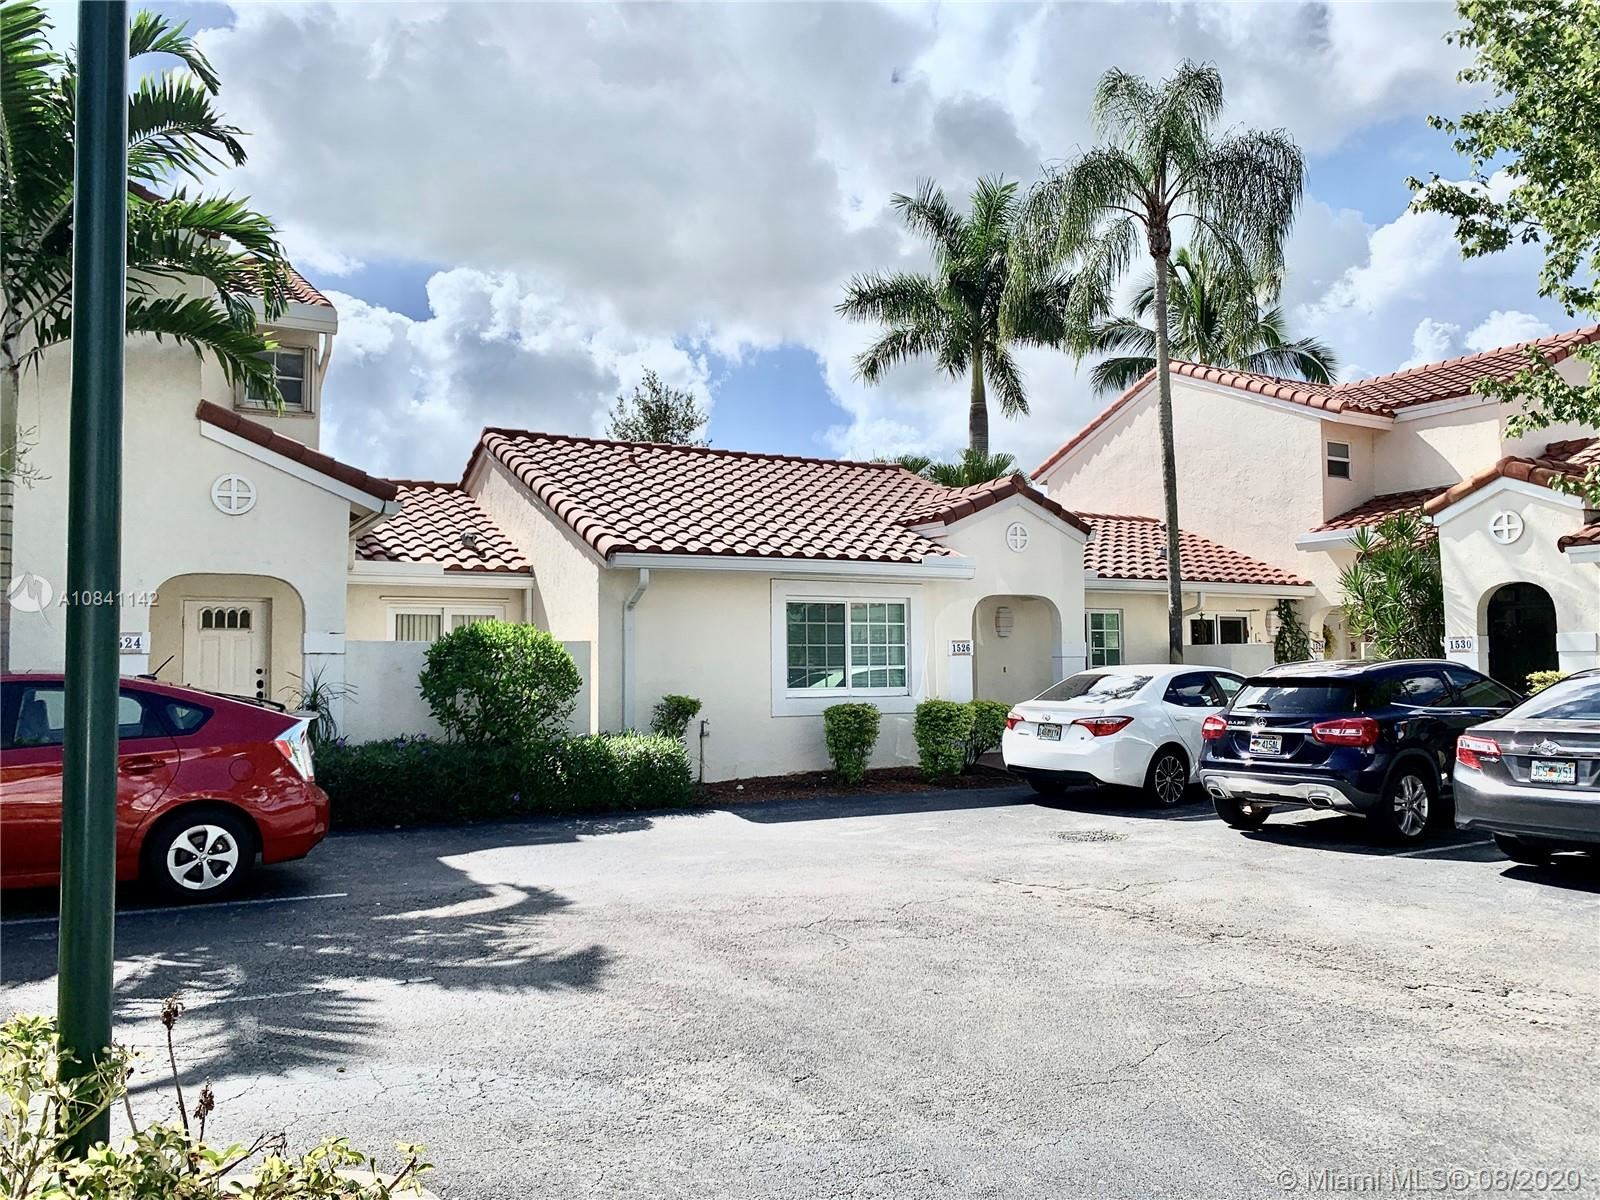 1526 Springside Ter, Weston, FL 33326 - #: A10841142